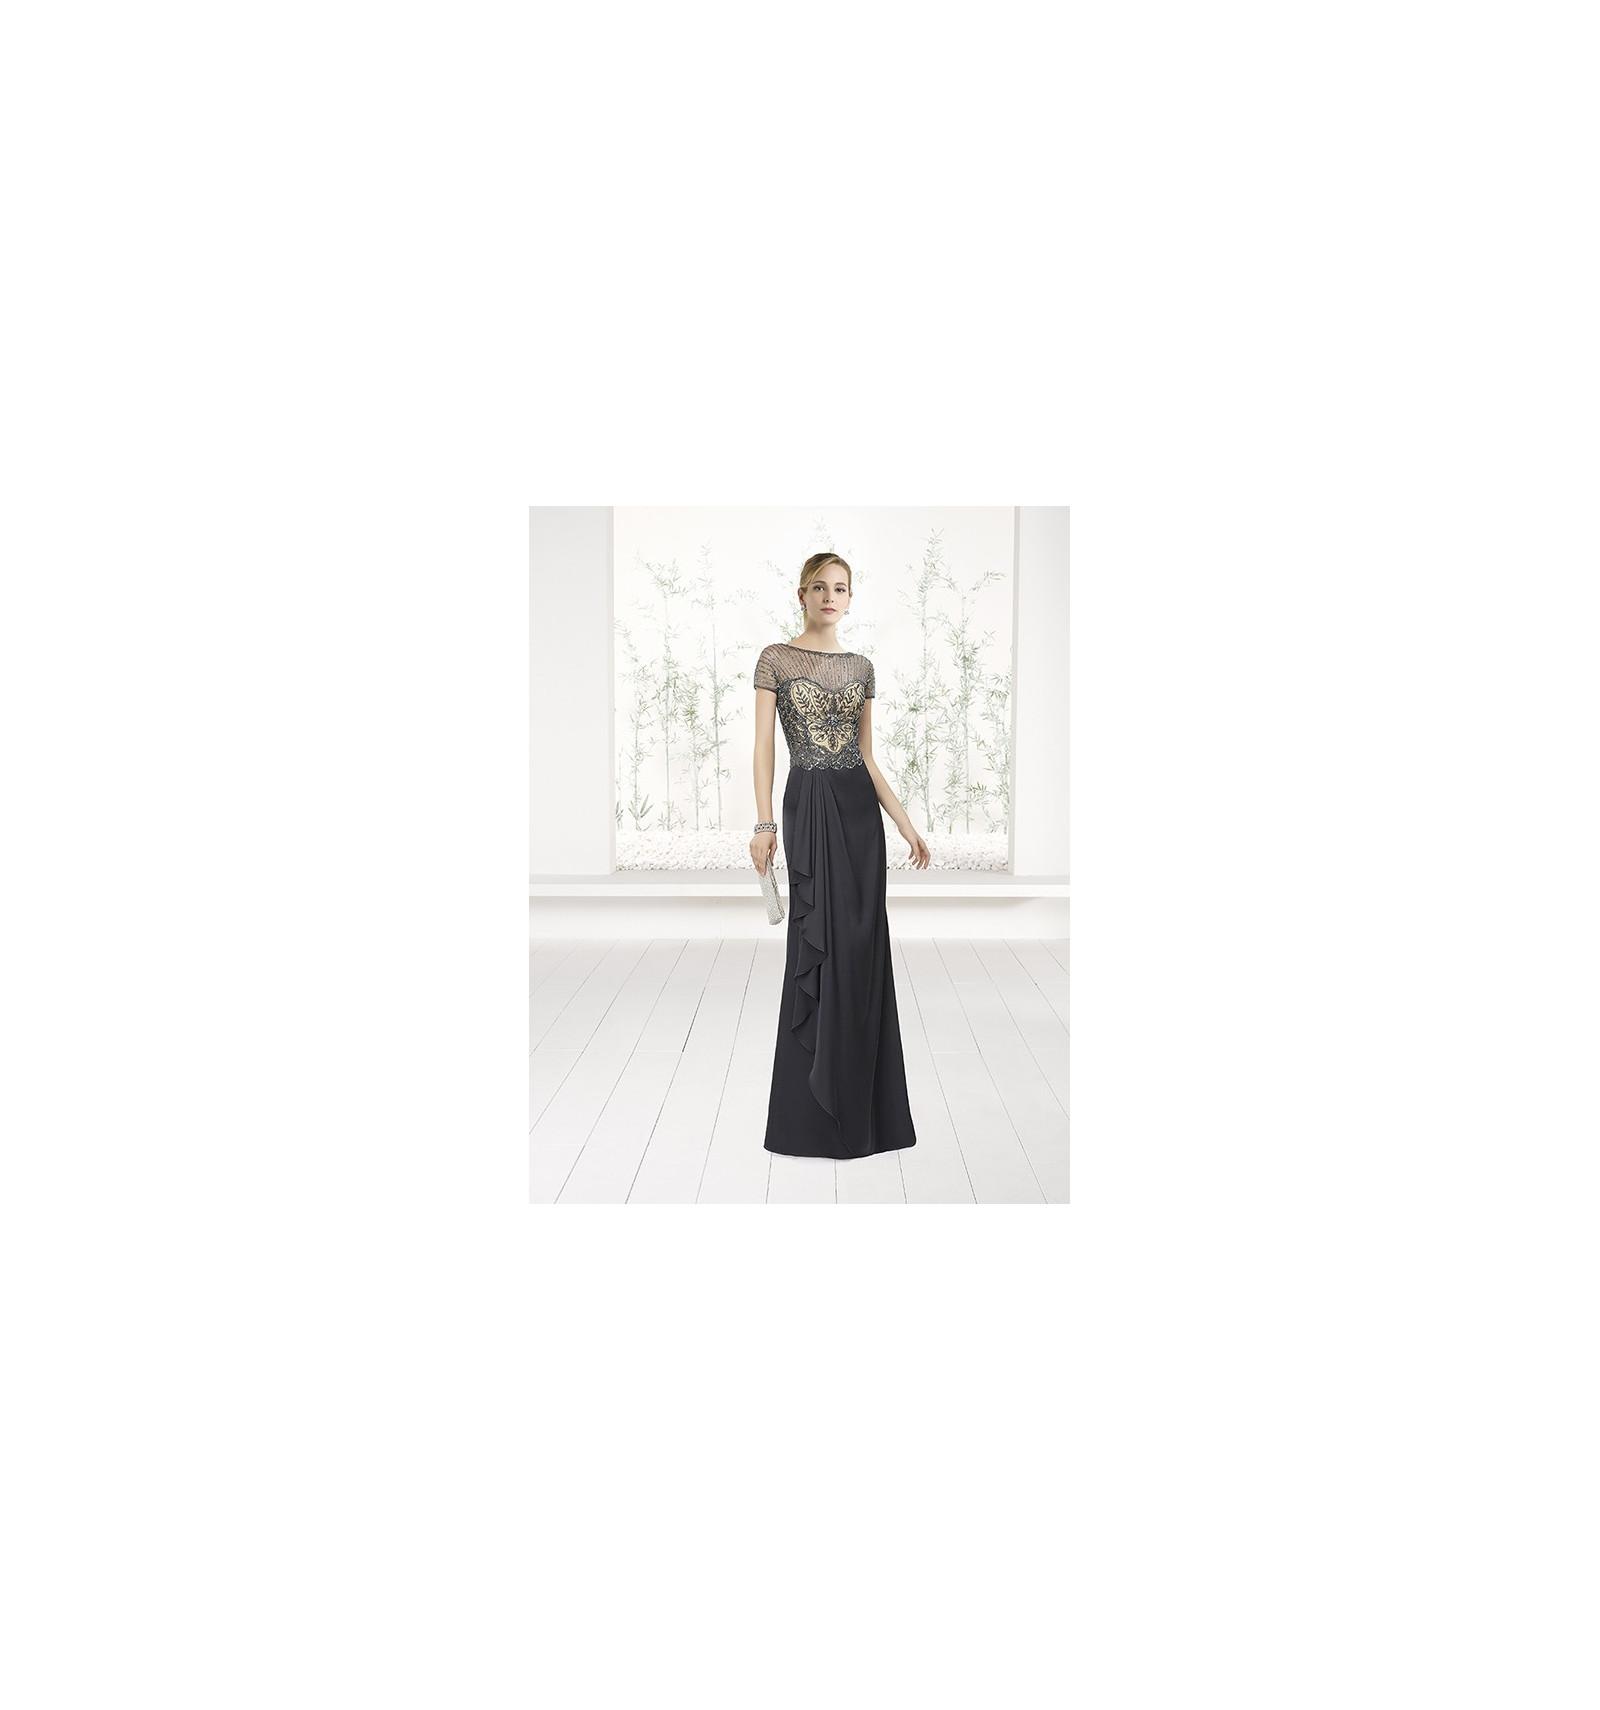 Vestidos fiesta lentejuelas online